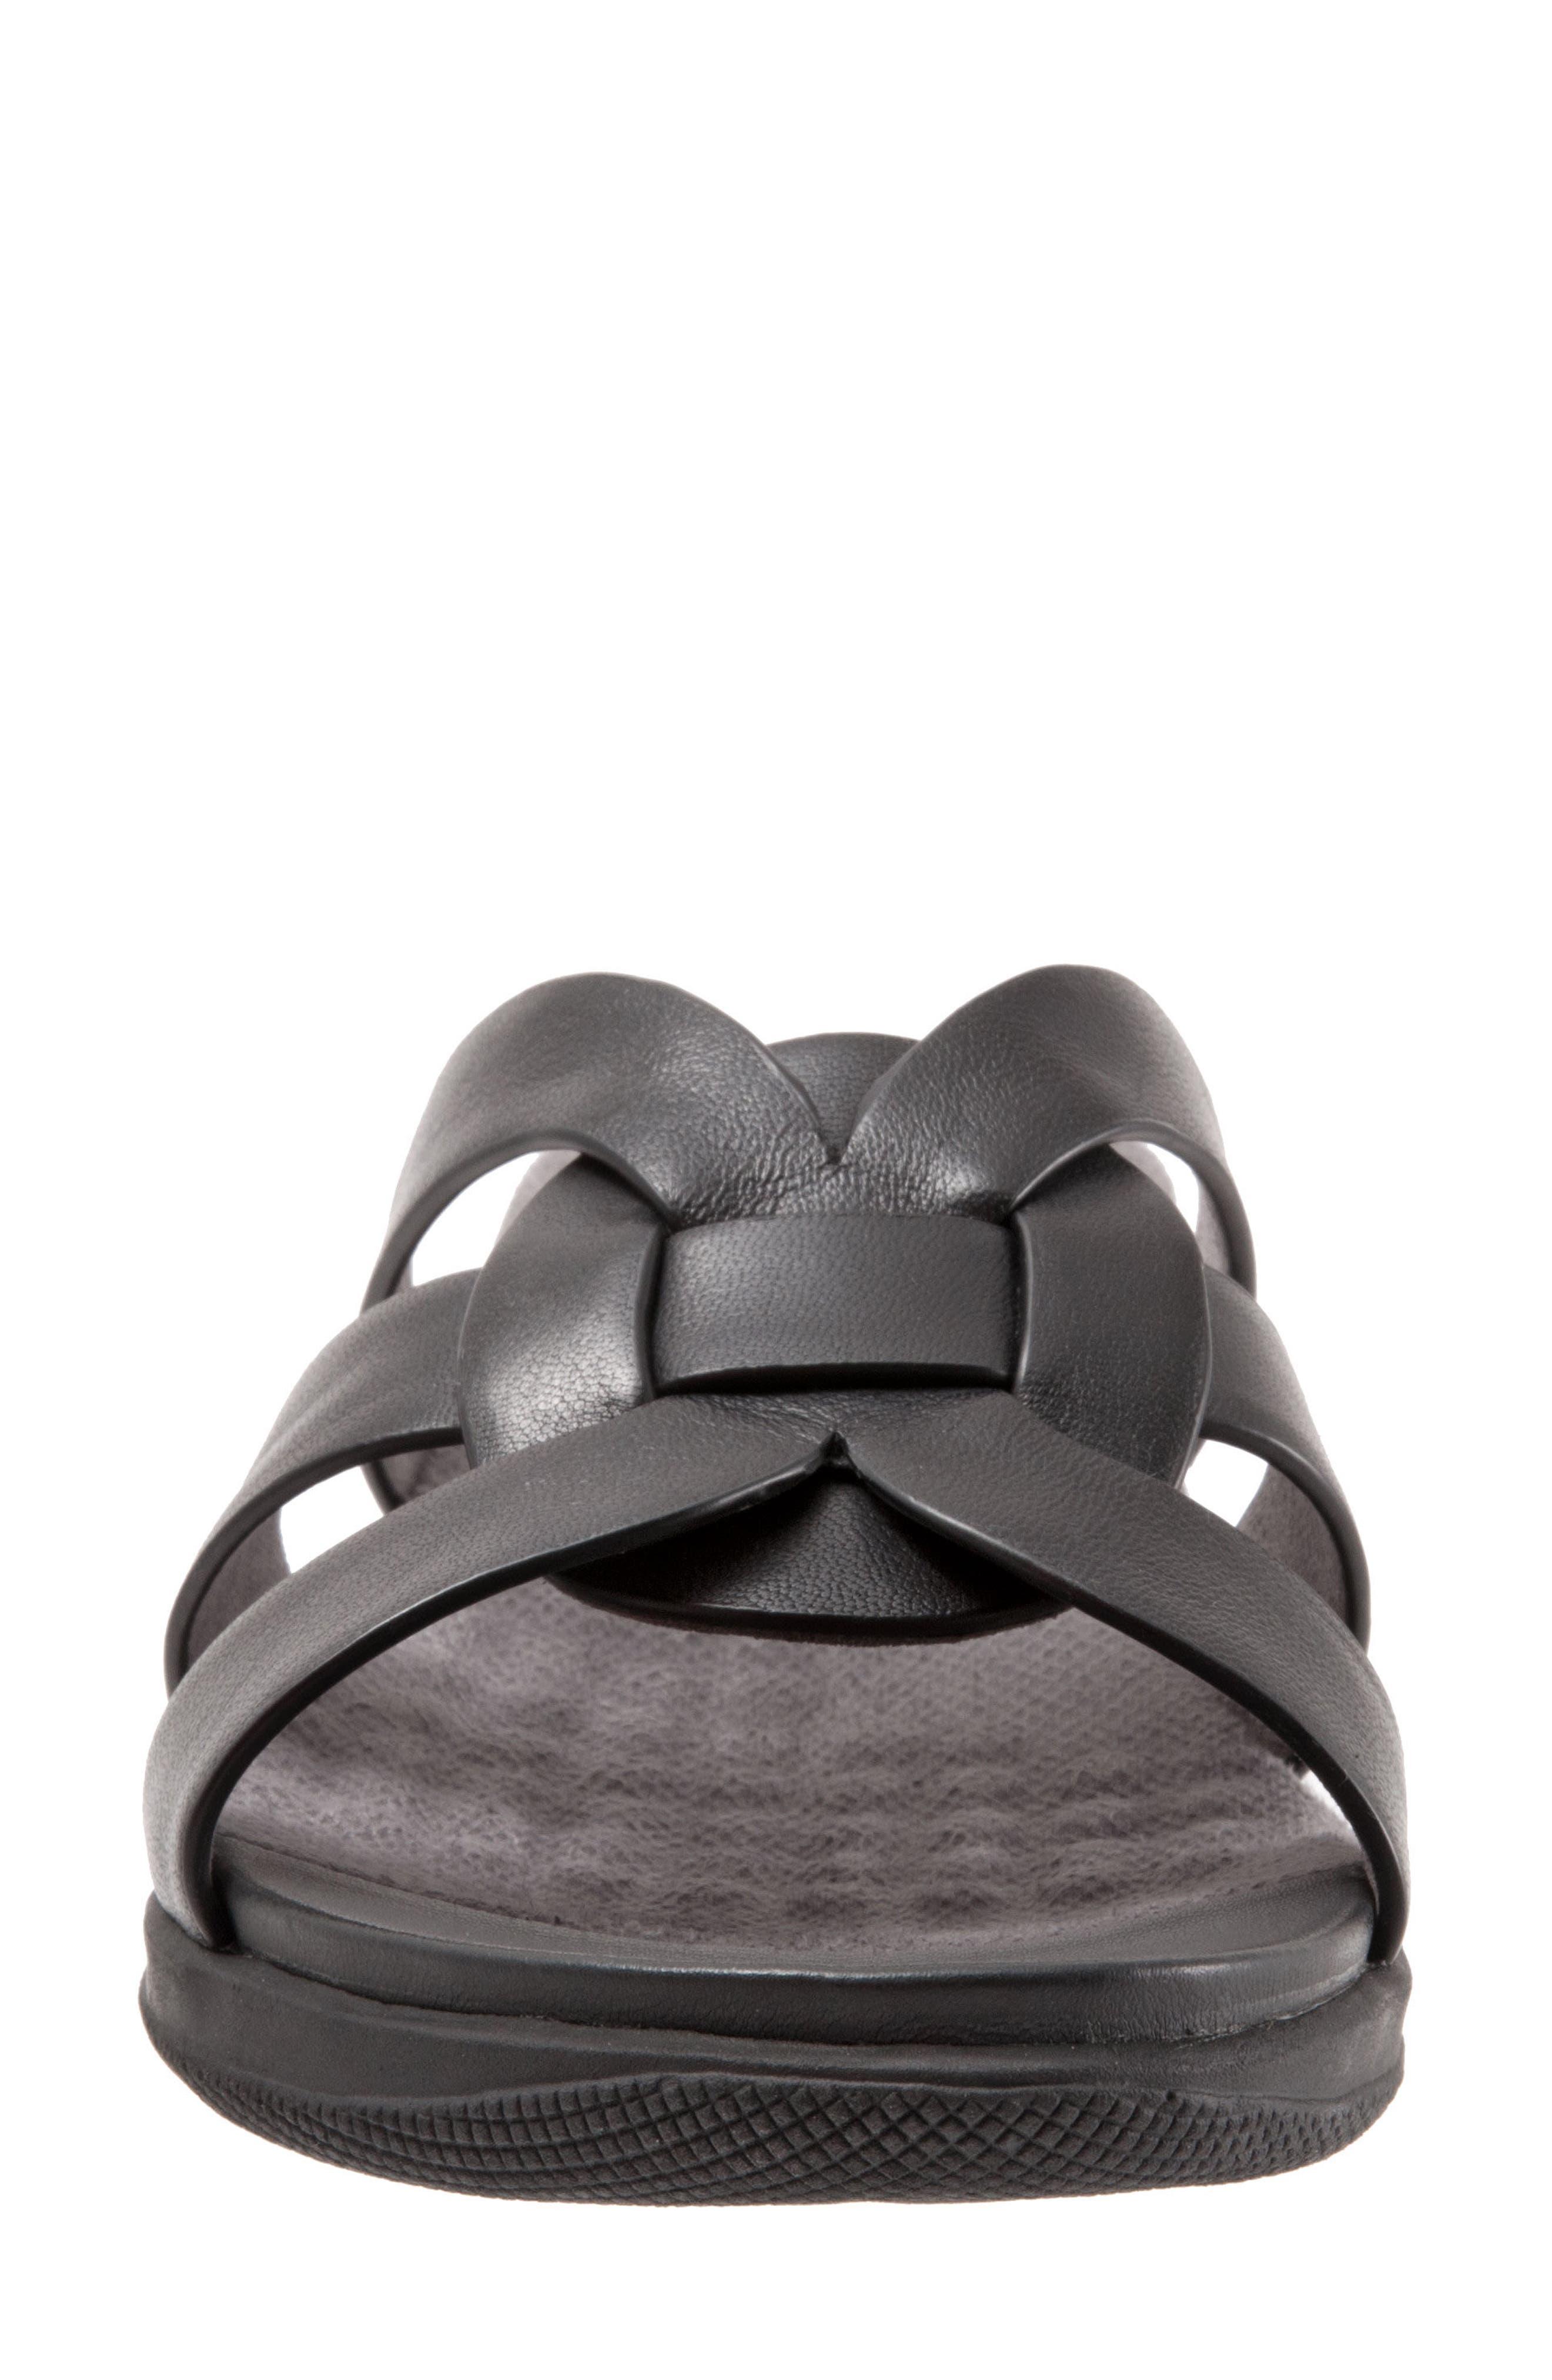 Thompson Slide Sandal,                             Alternate thumbnail 4, color,                             Black Leather